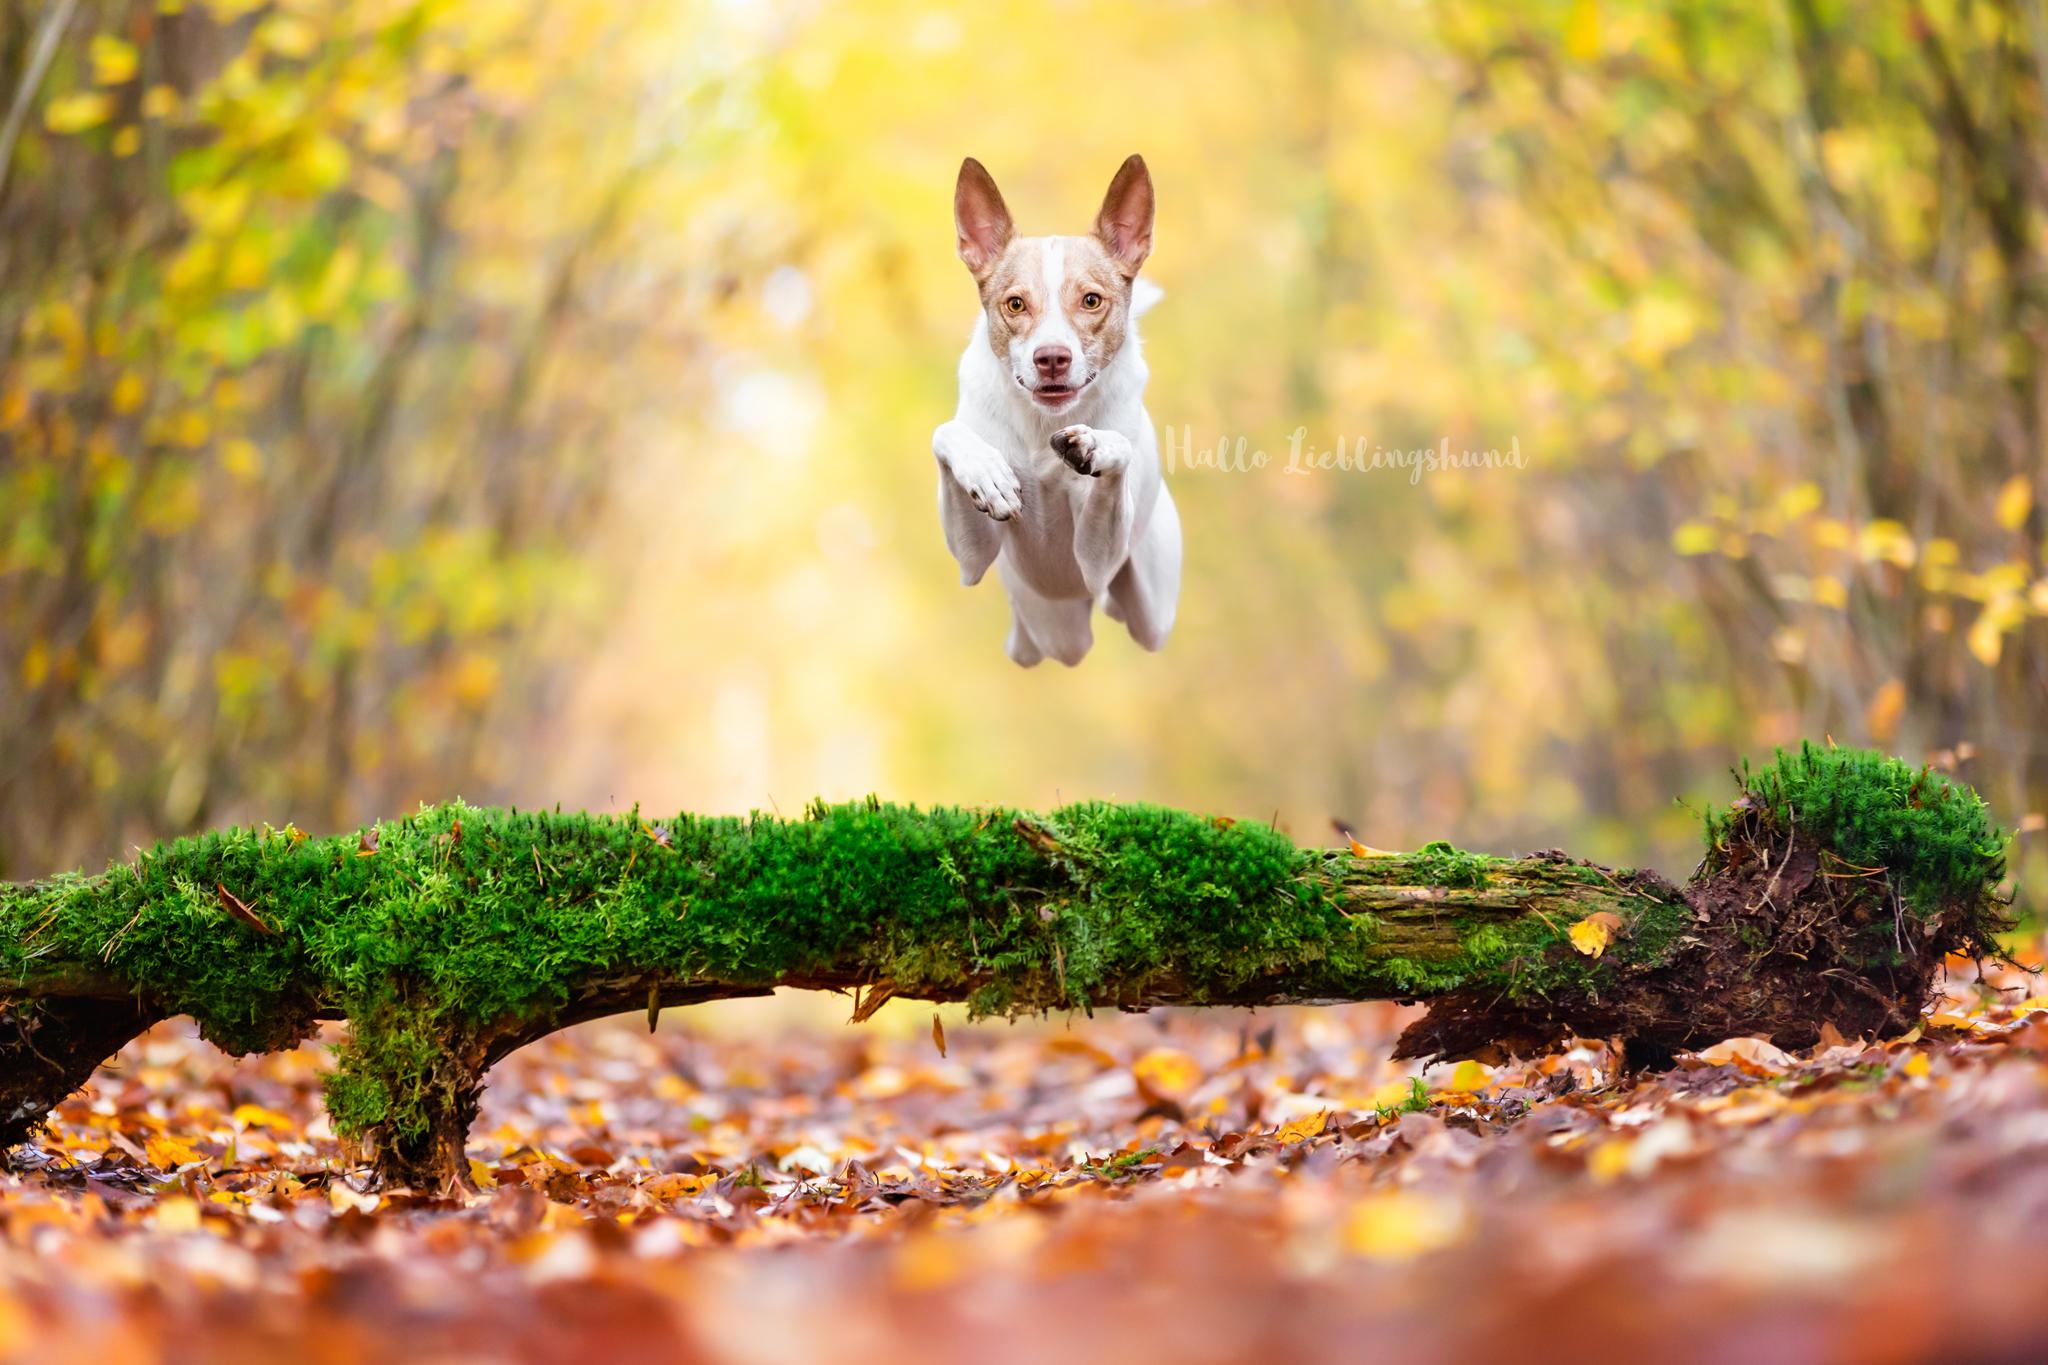 Outdoor Shooting - Shooting mit Hund draußen | Action im Wald